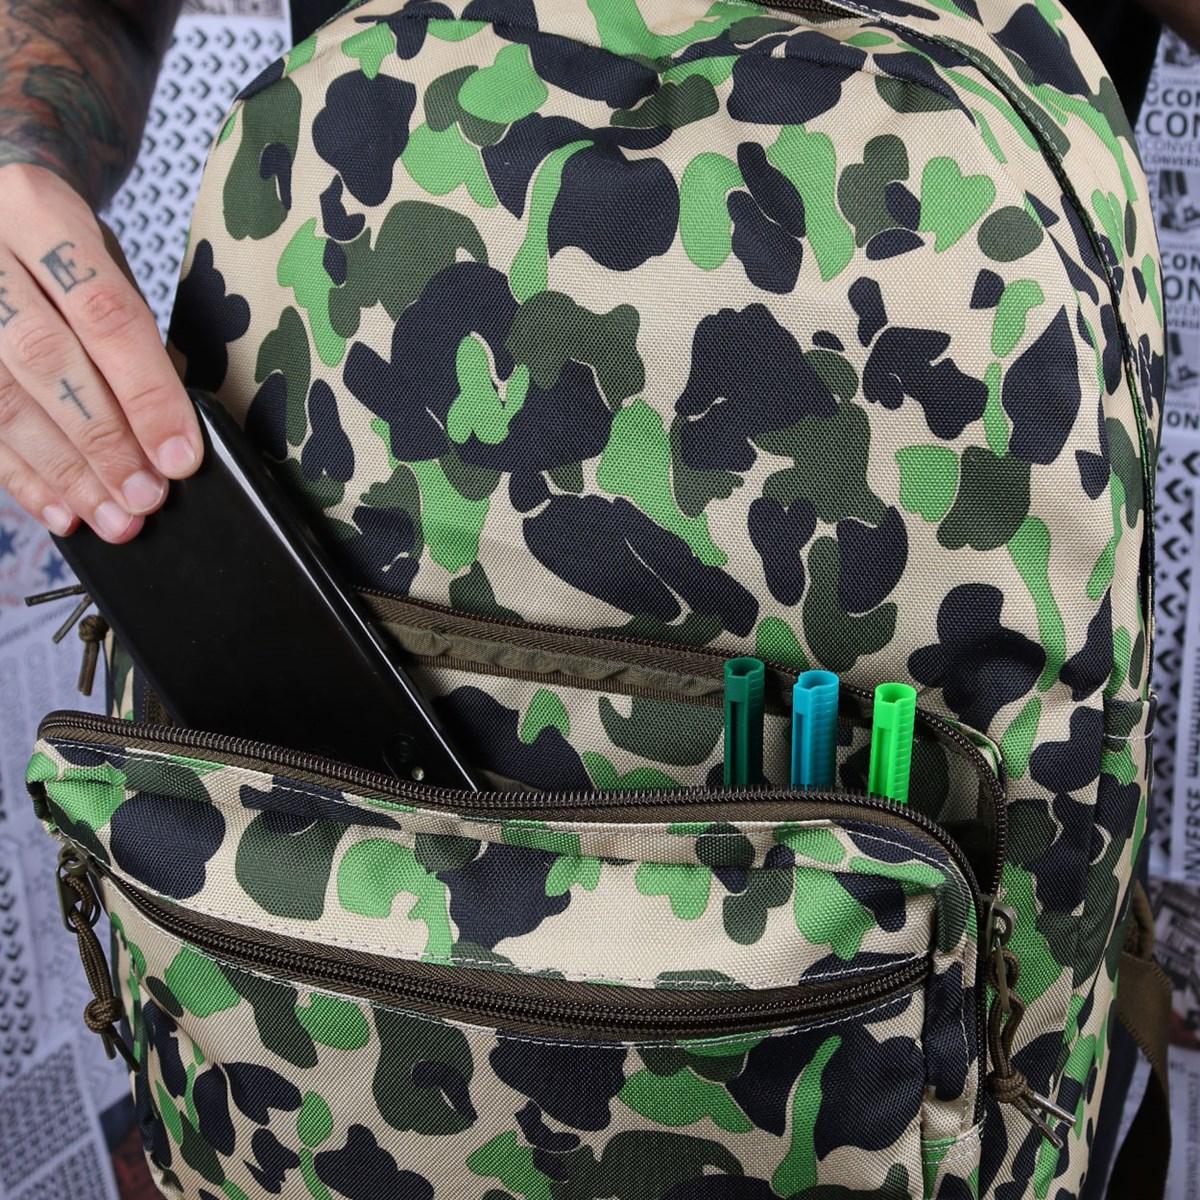 Mochila Converse Go 2 Backpack Camo Surplus Olive 10017272-A04